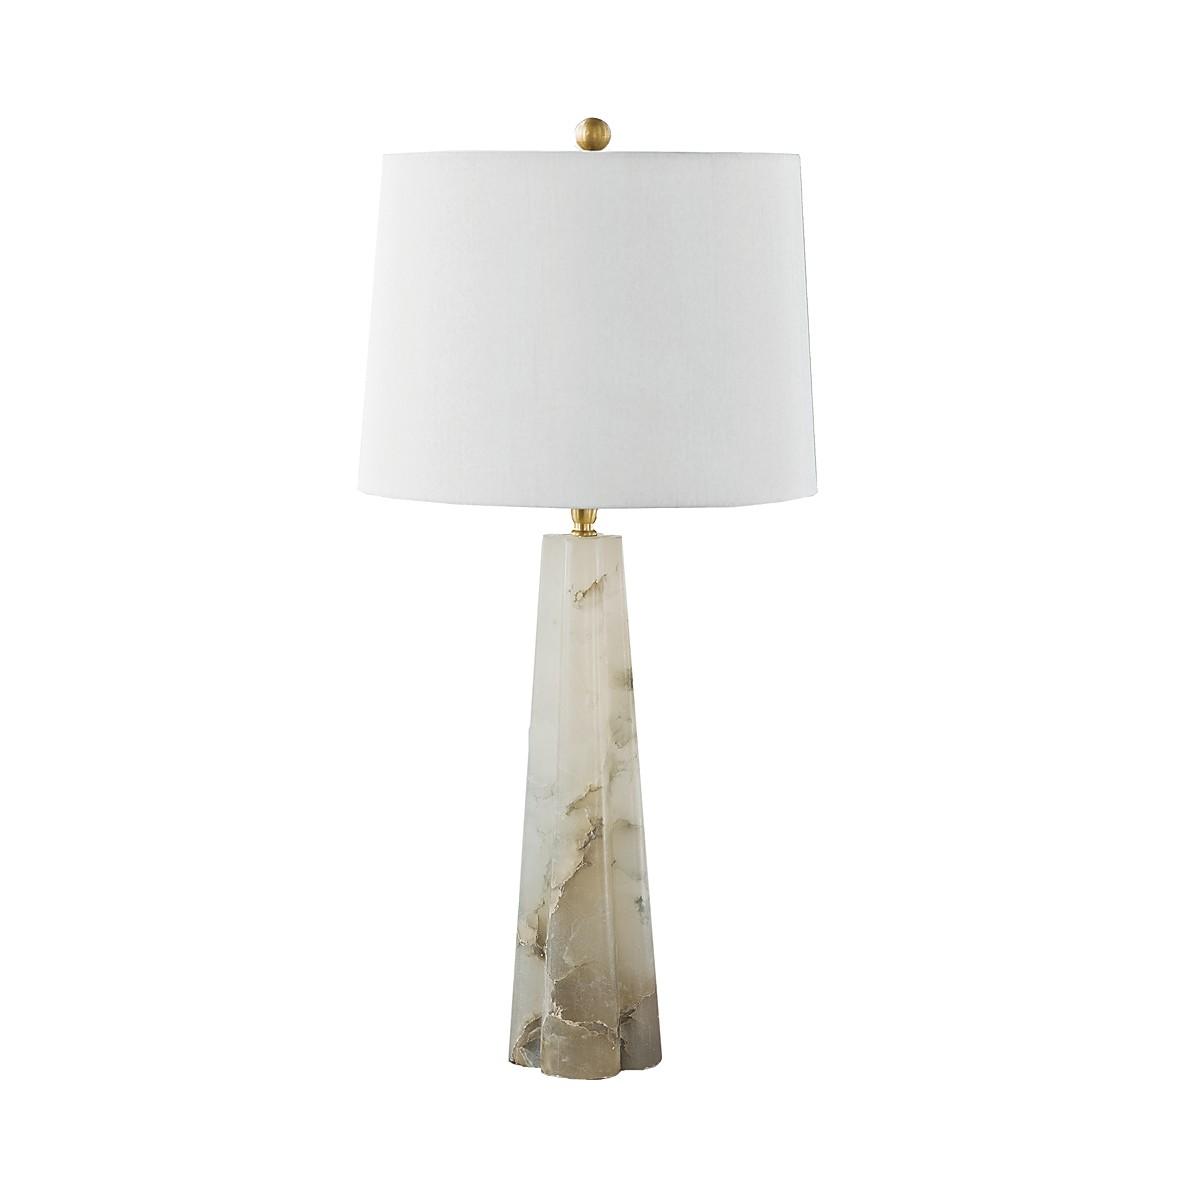 brass regina raven design lamp floor natural lamps andrew pin